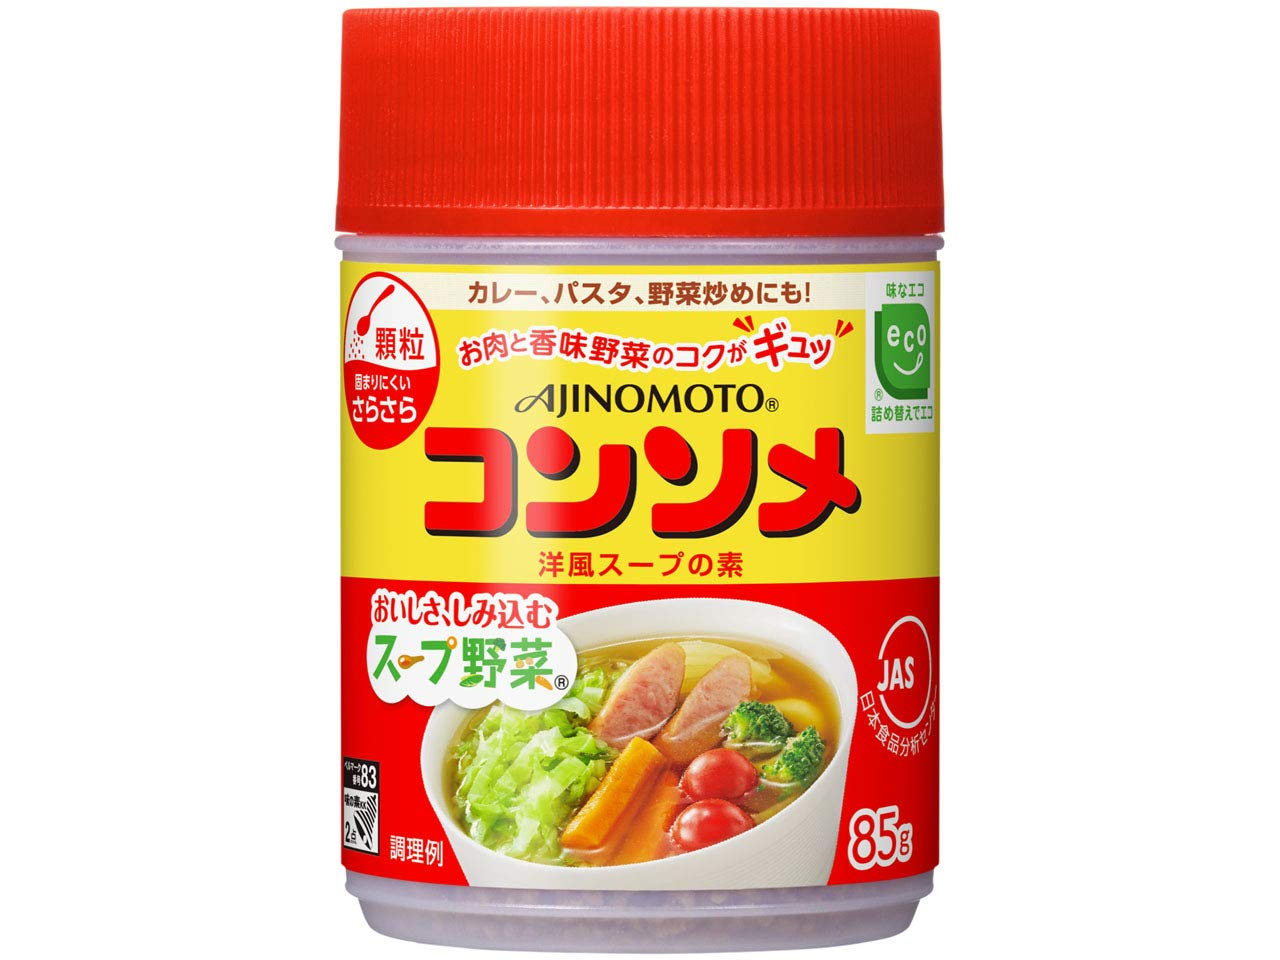 Ajinomoto KK consomme granules 85gX4 pieces [Parallel import] by Ajinomoto